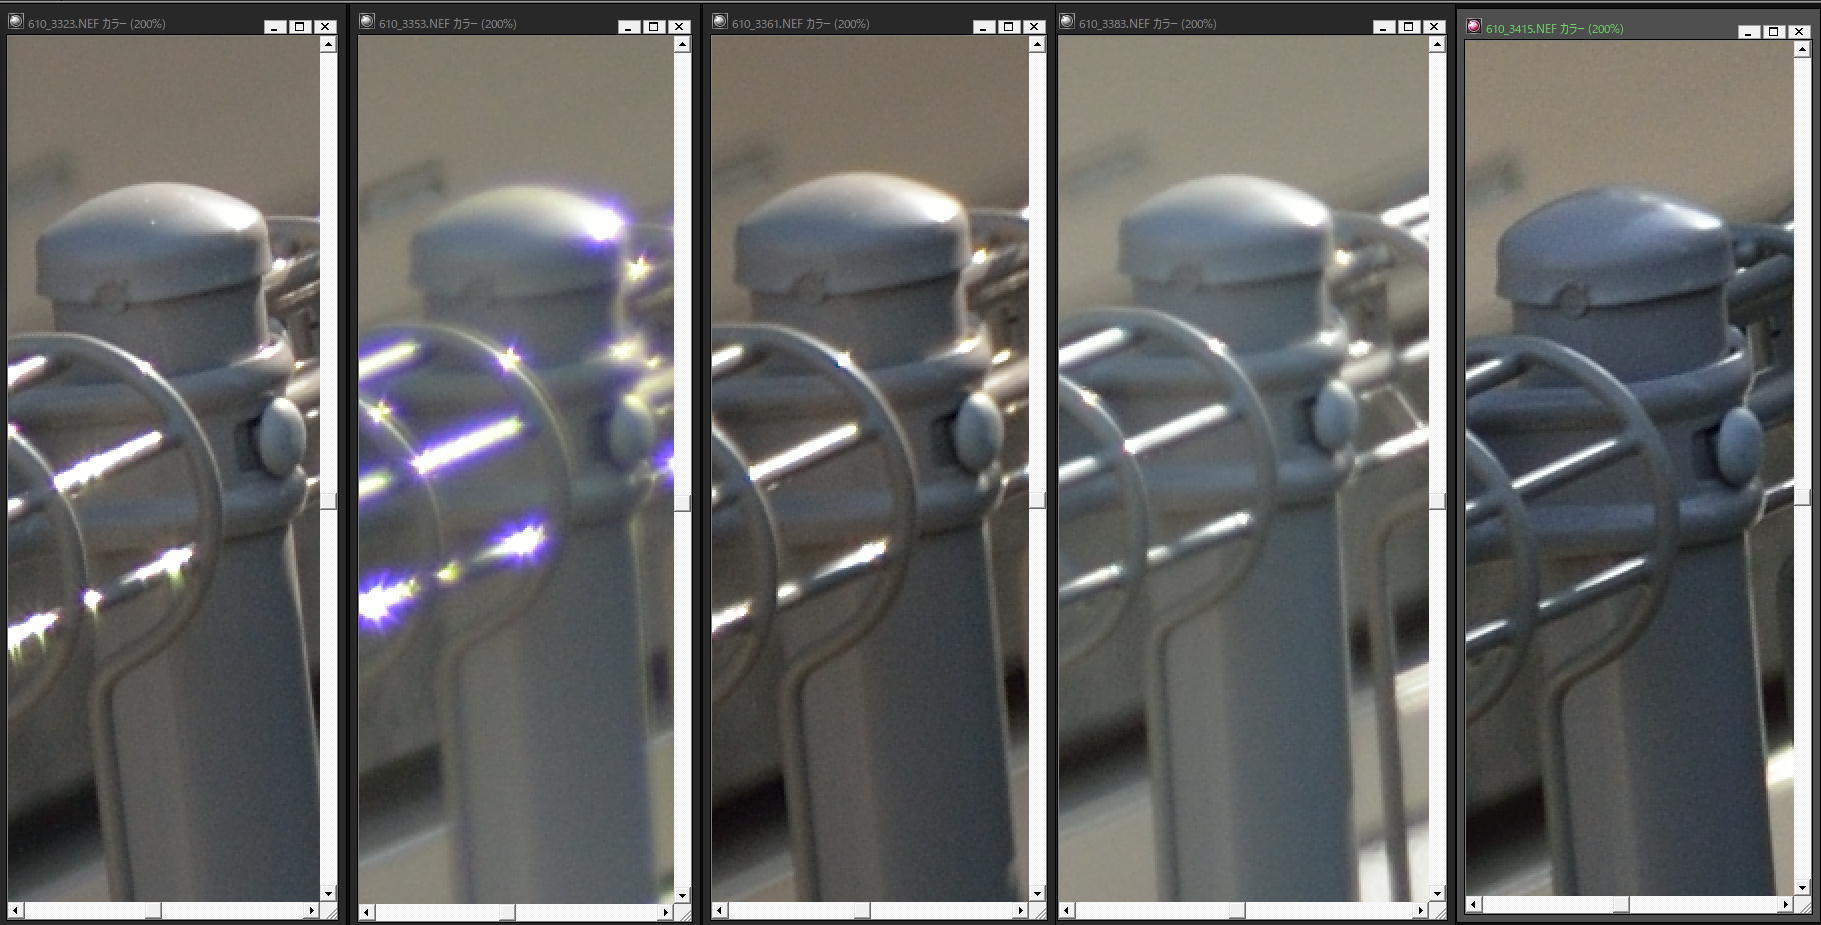 300mm級望遠レンズ『総点検ごっこ』始動_f0346040_12300646.jpg